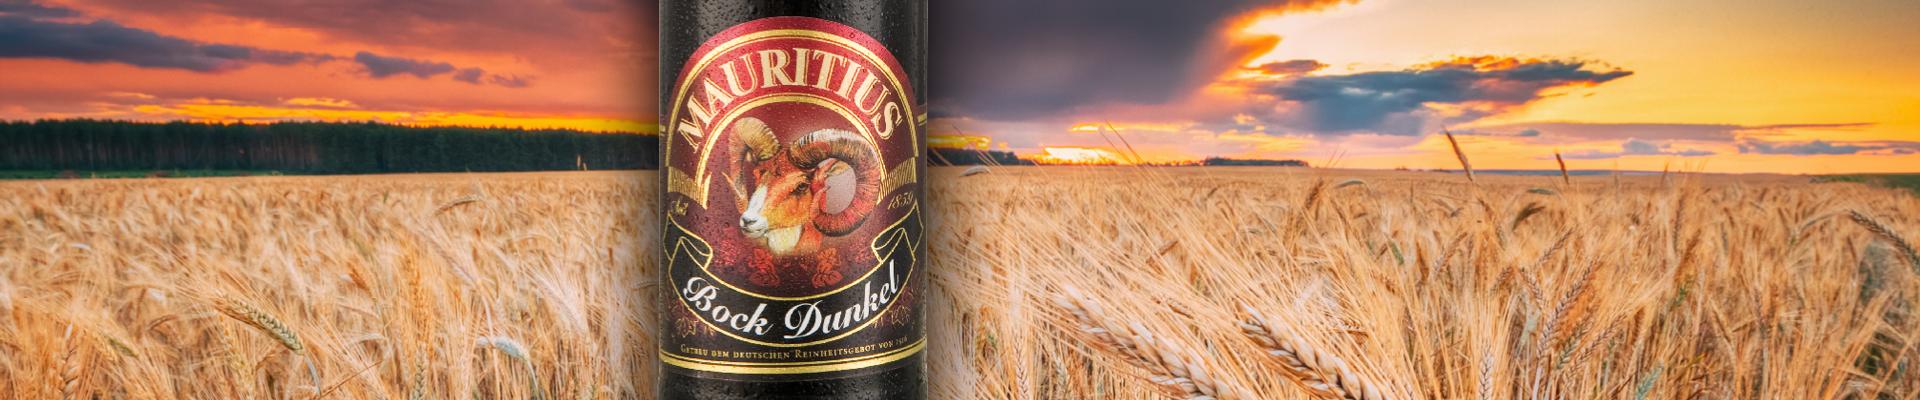 Mauritius: Biere: Bock Dunkel